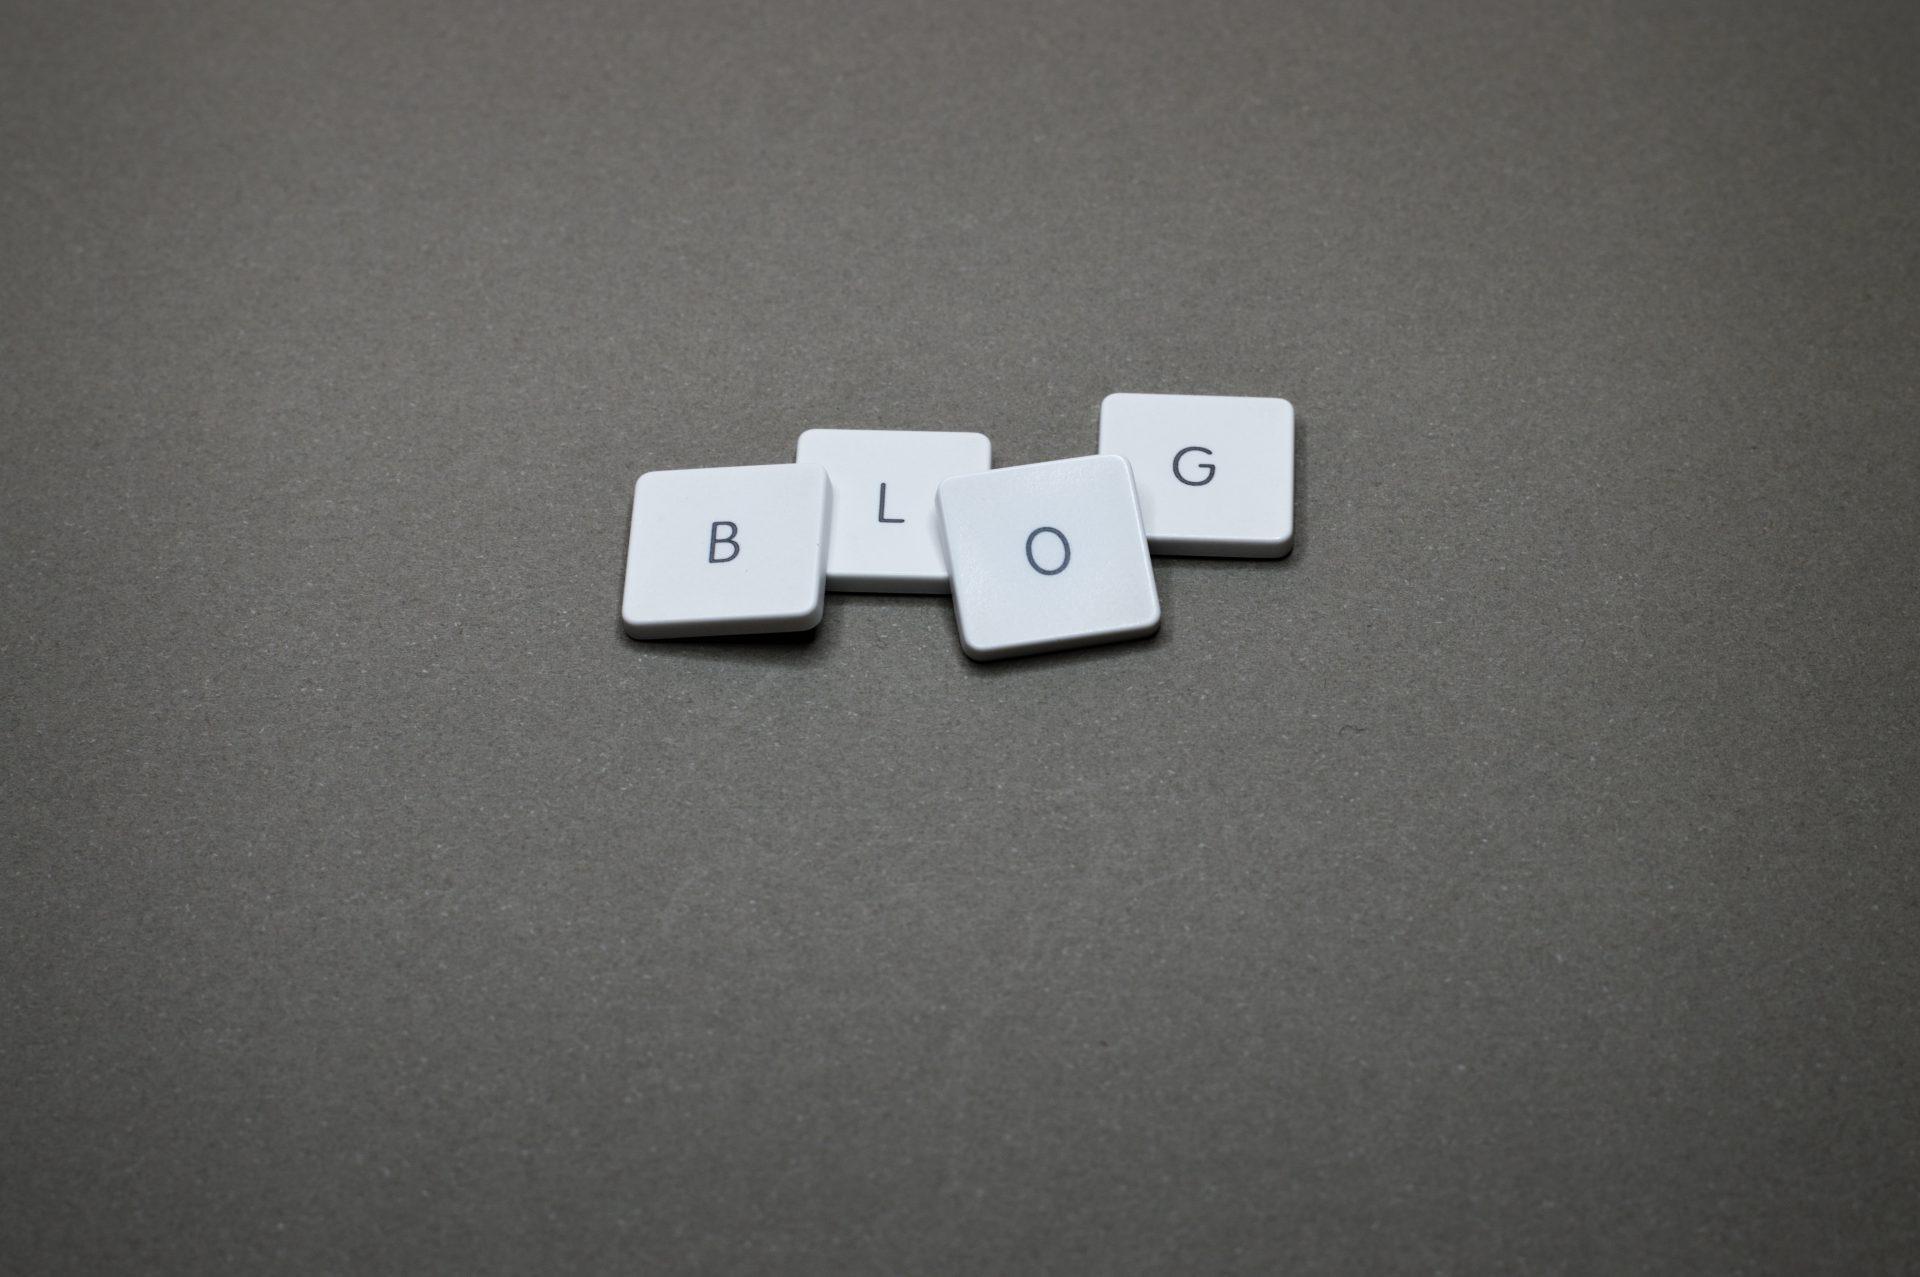 wpis na blog po angielsku jak napisać